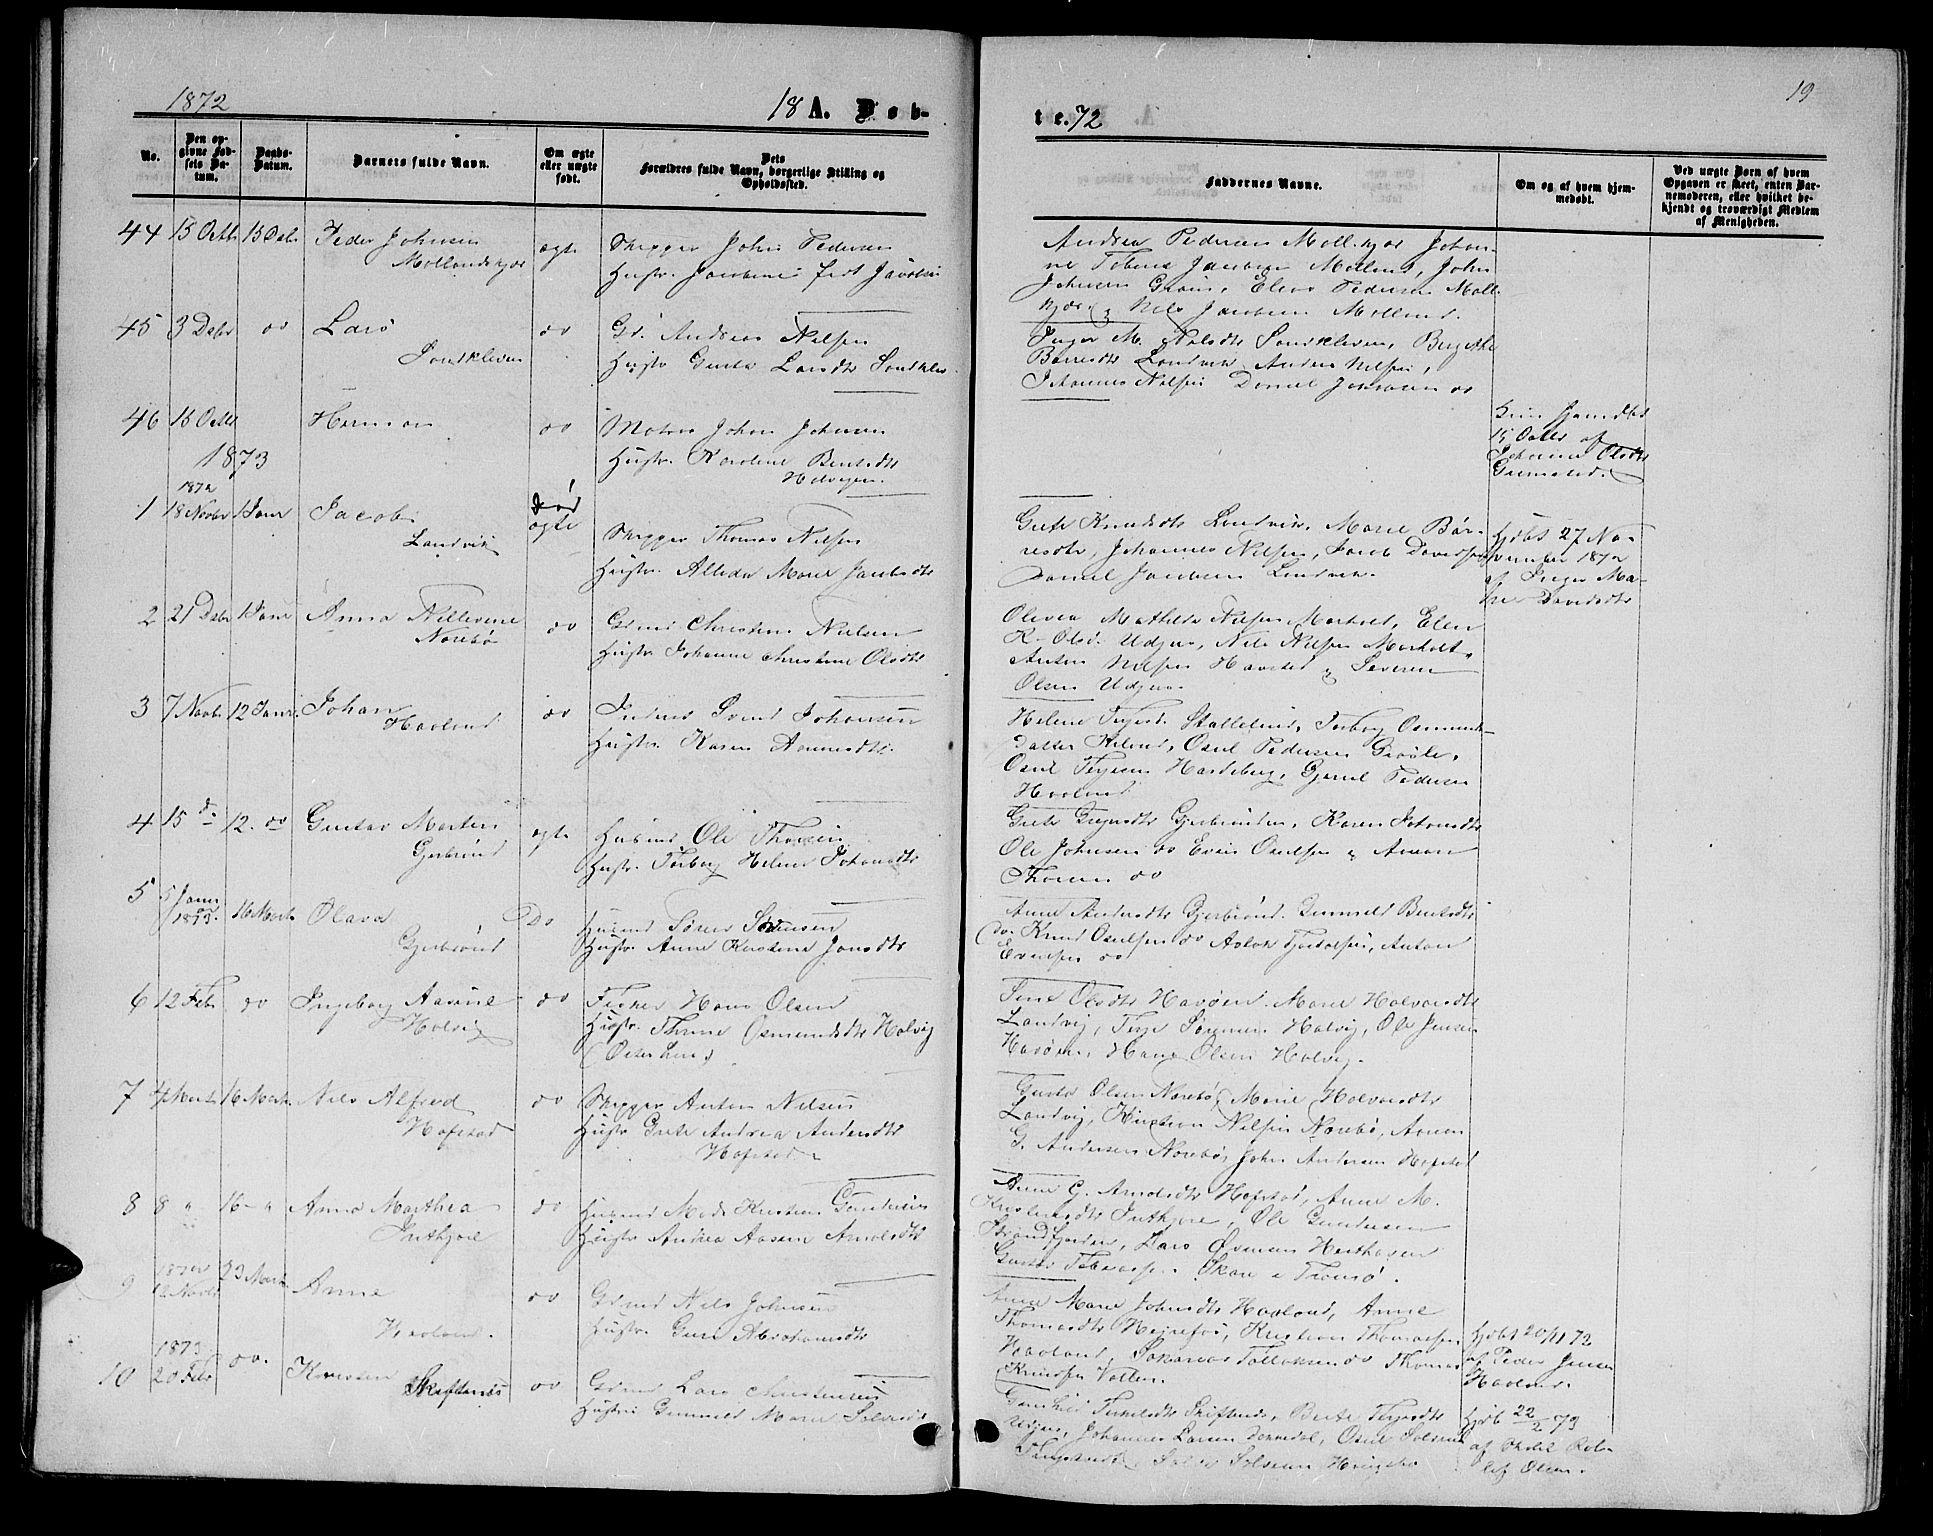 SAK, Hommedal sokneprestkontor, F/Fb/Fbb/L0006: Klokkerbok nr. B 6, 1869-1884, s. 19